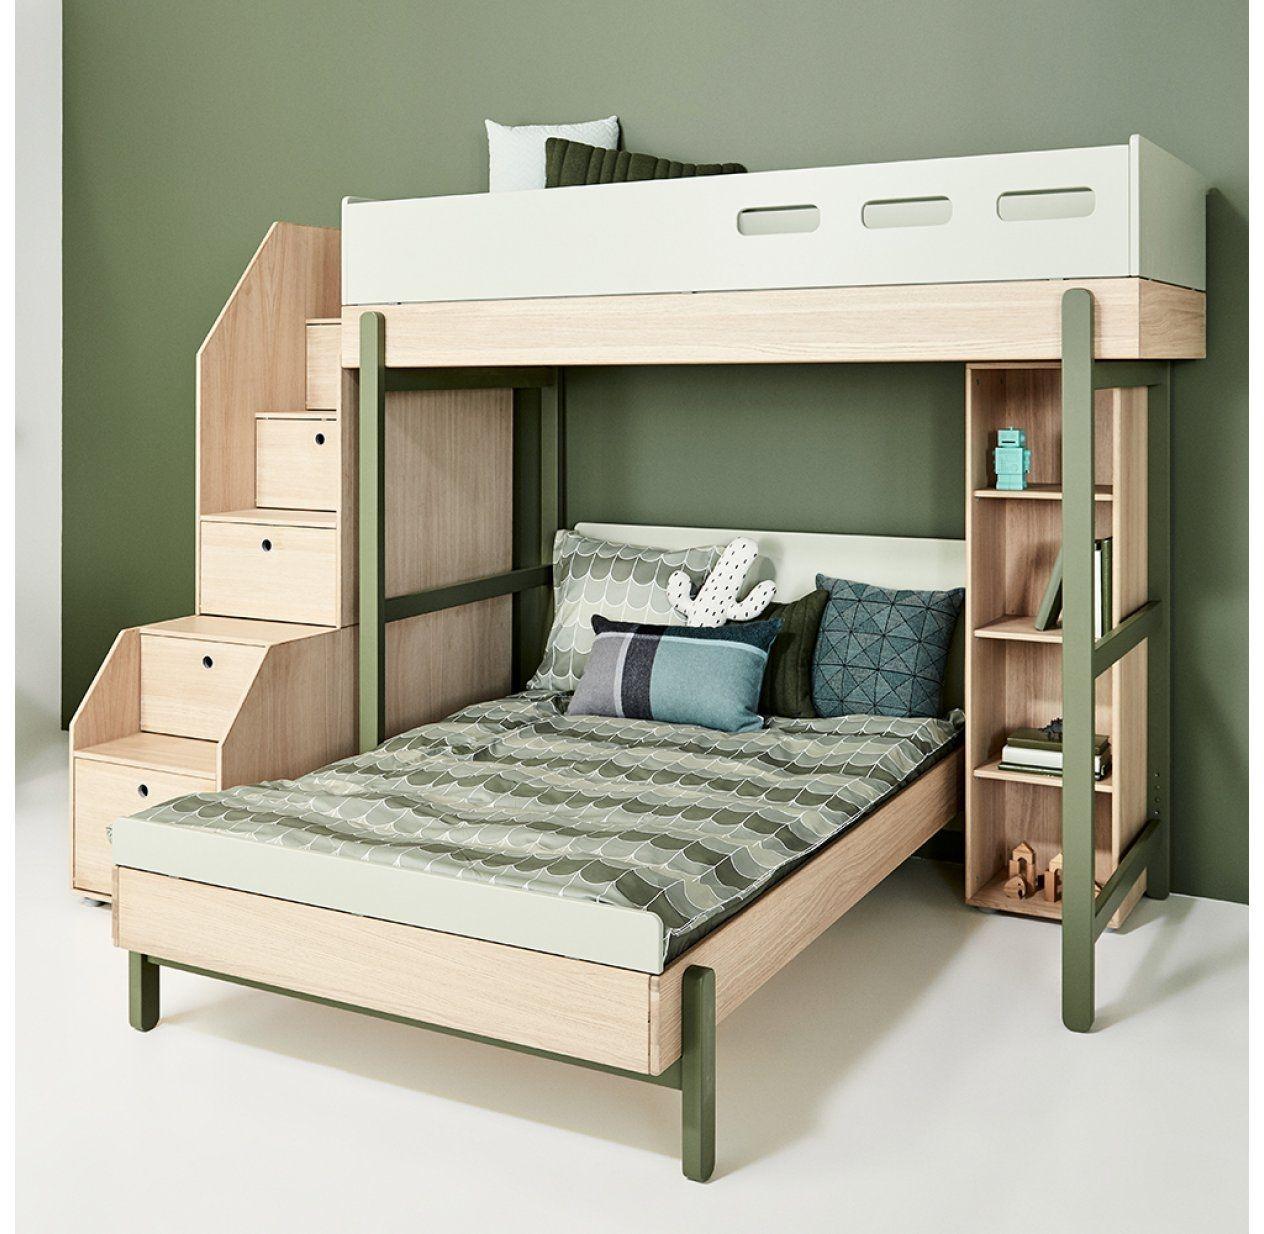 Lit Superpose Et Mezzanine In 2020 Diy Bunk Bed Childrens Furniture Flexa Bed